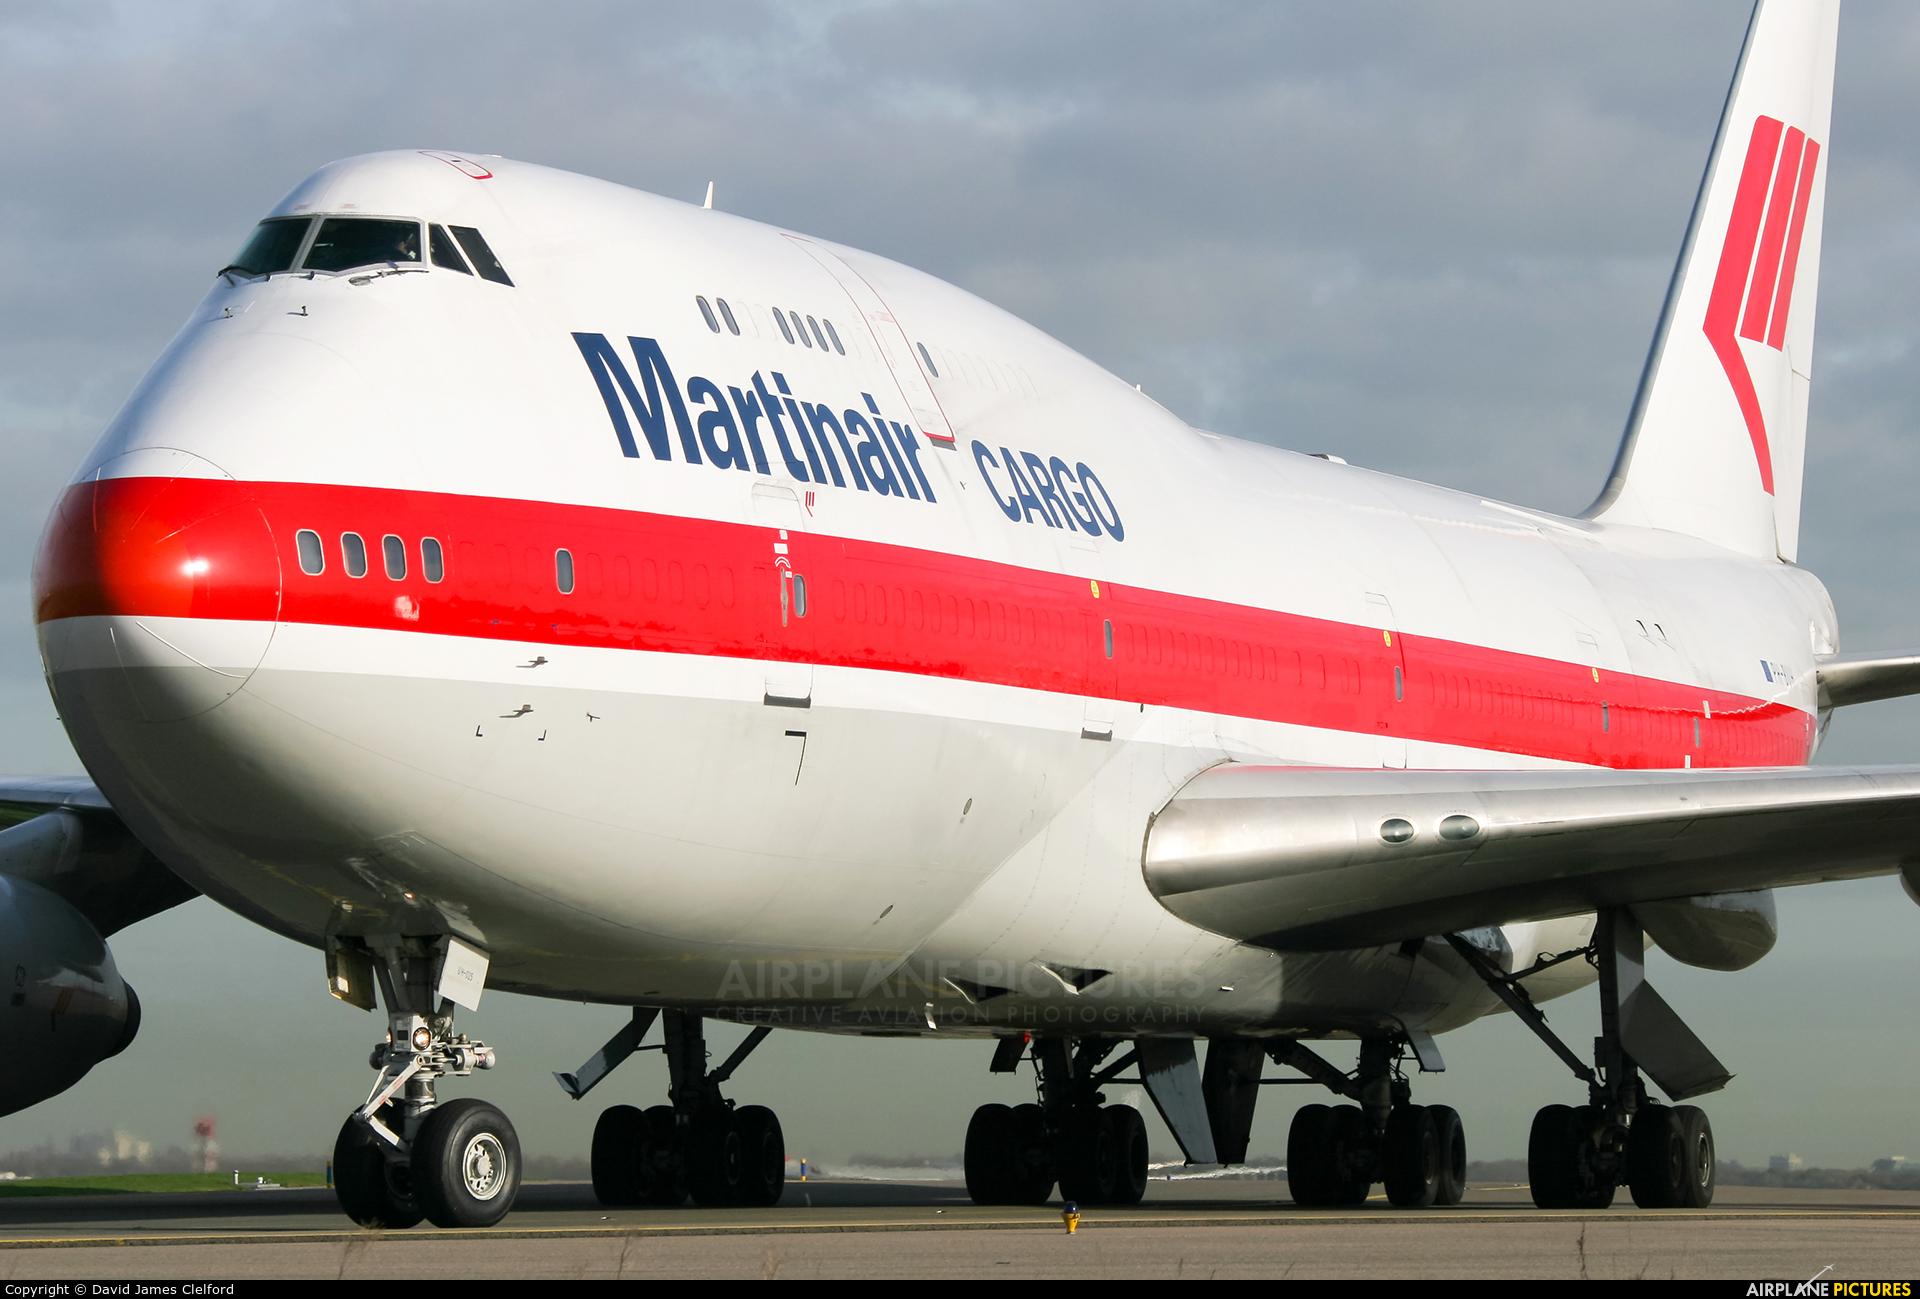 Martinair Cargo PH-BUH aircraft at Amsterdam - Schiphol